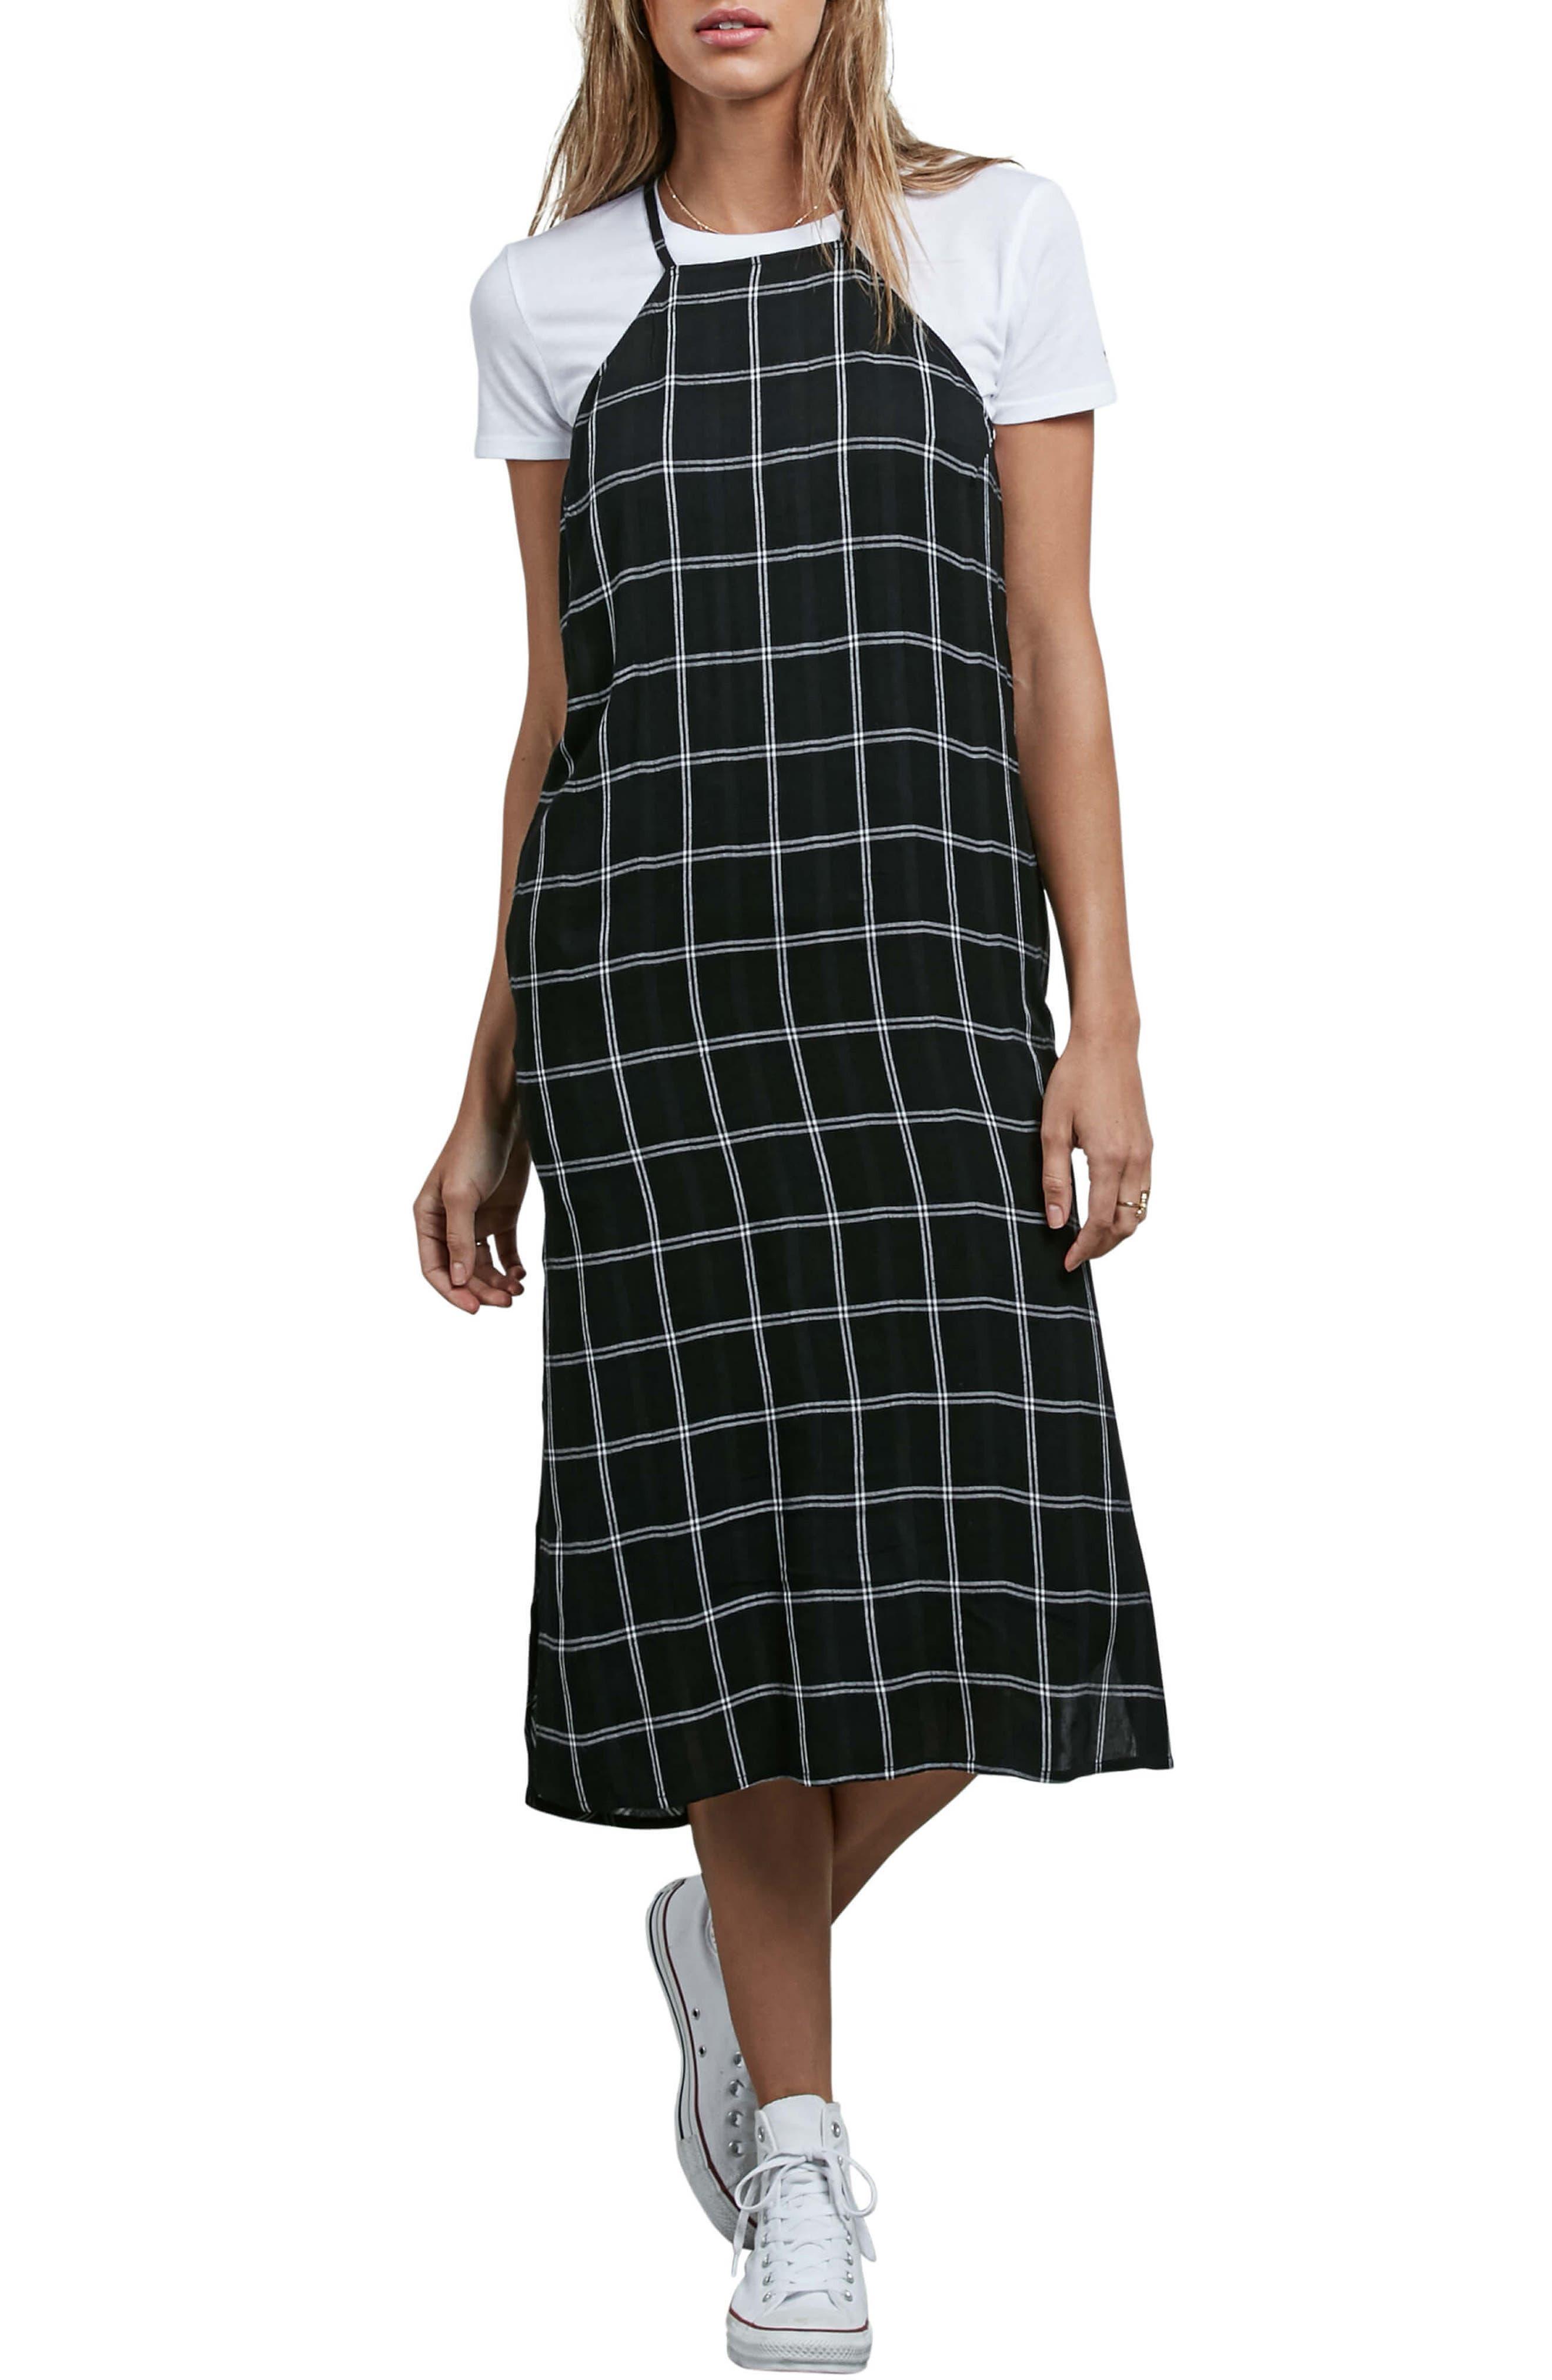 Jumponit Windowpane Print Midi Dress,                             Main thumbnail 1, color,